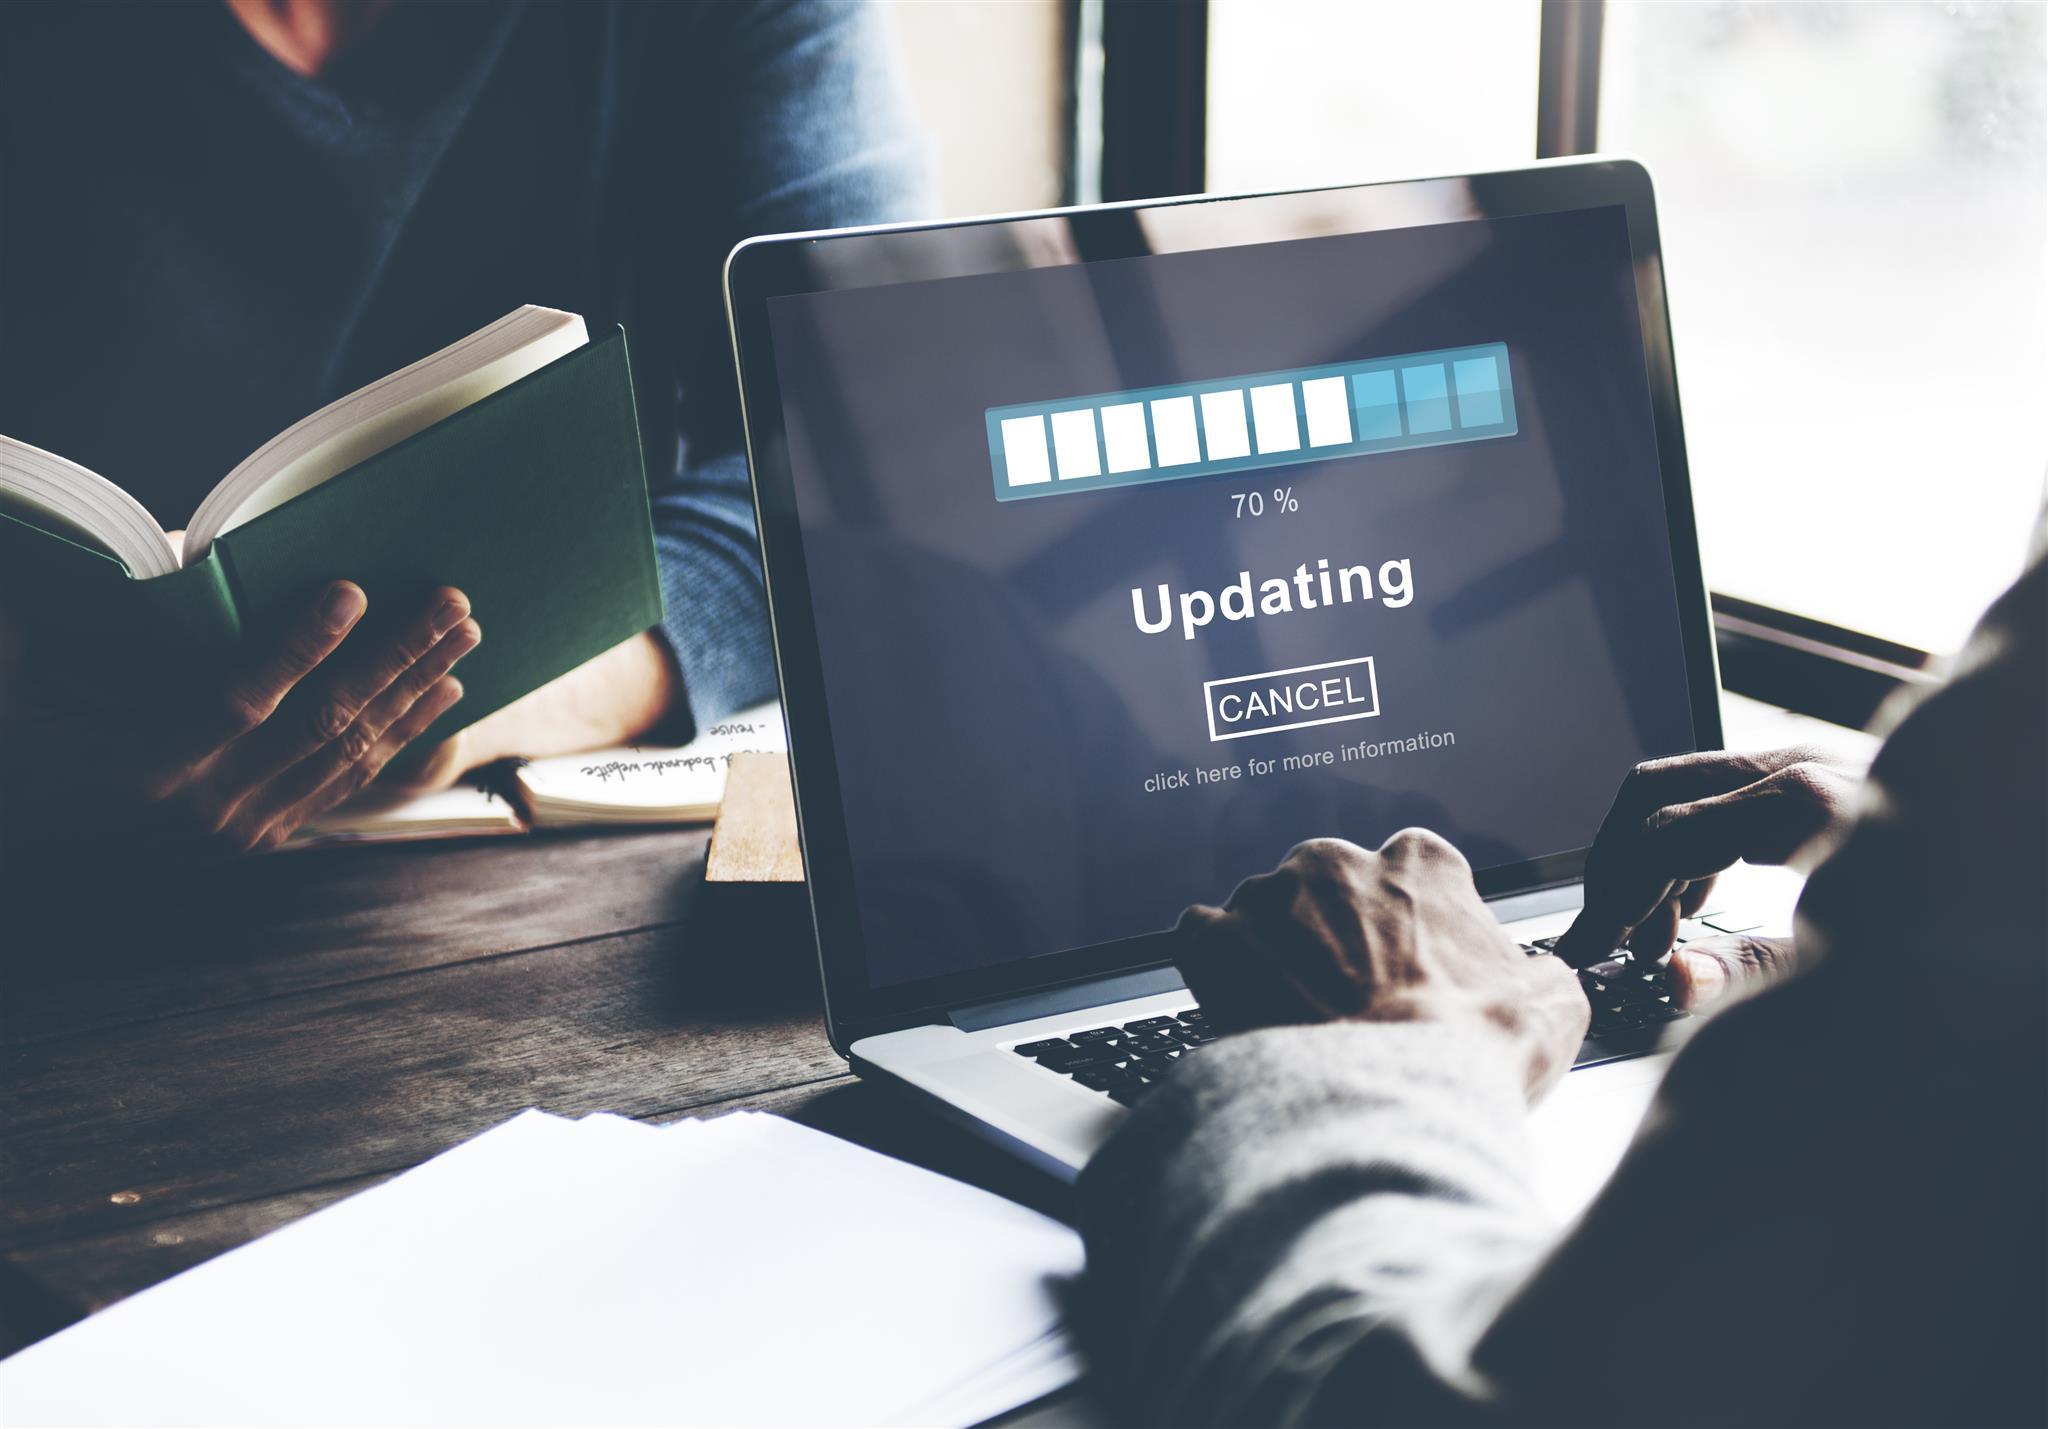 How to resolve Fatal Error C0000034 Applying Update Operation error?